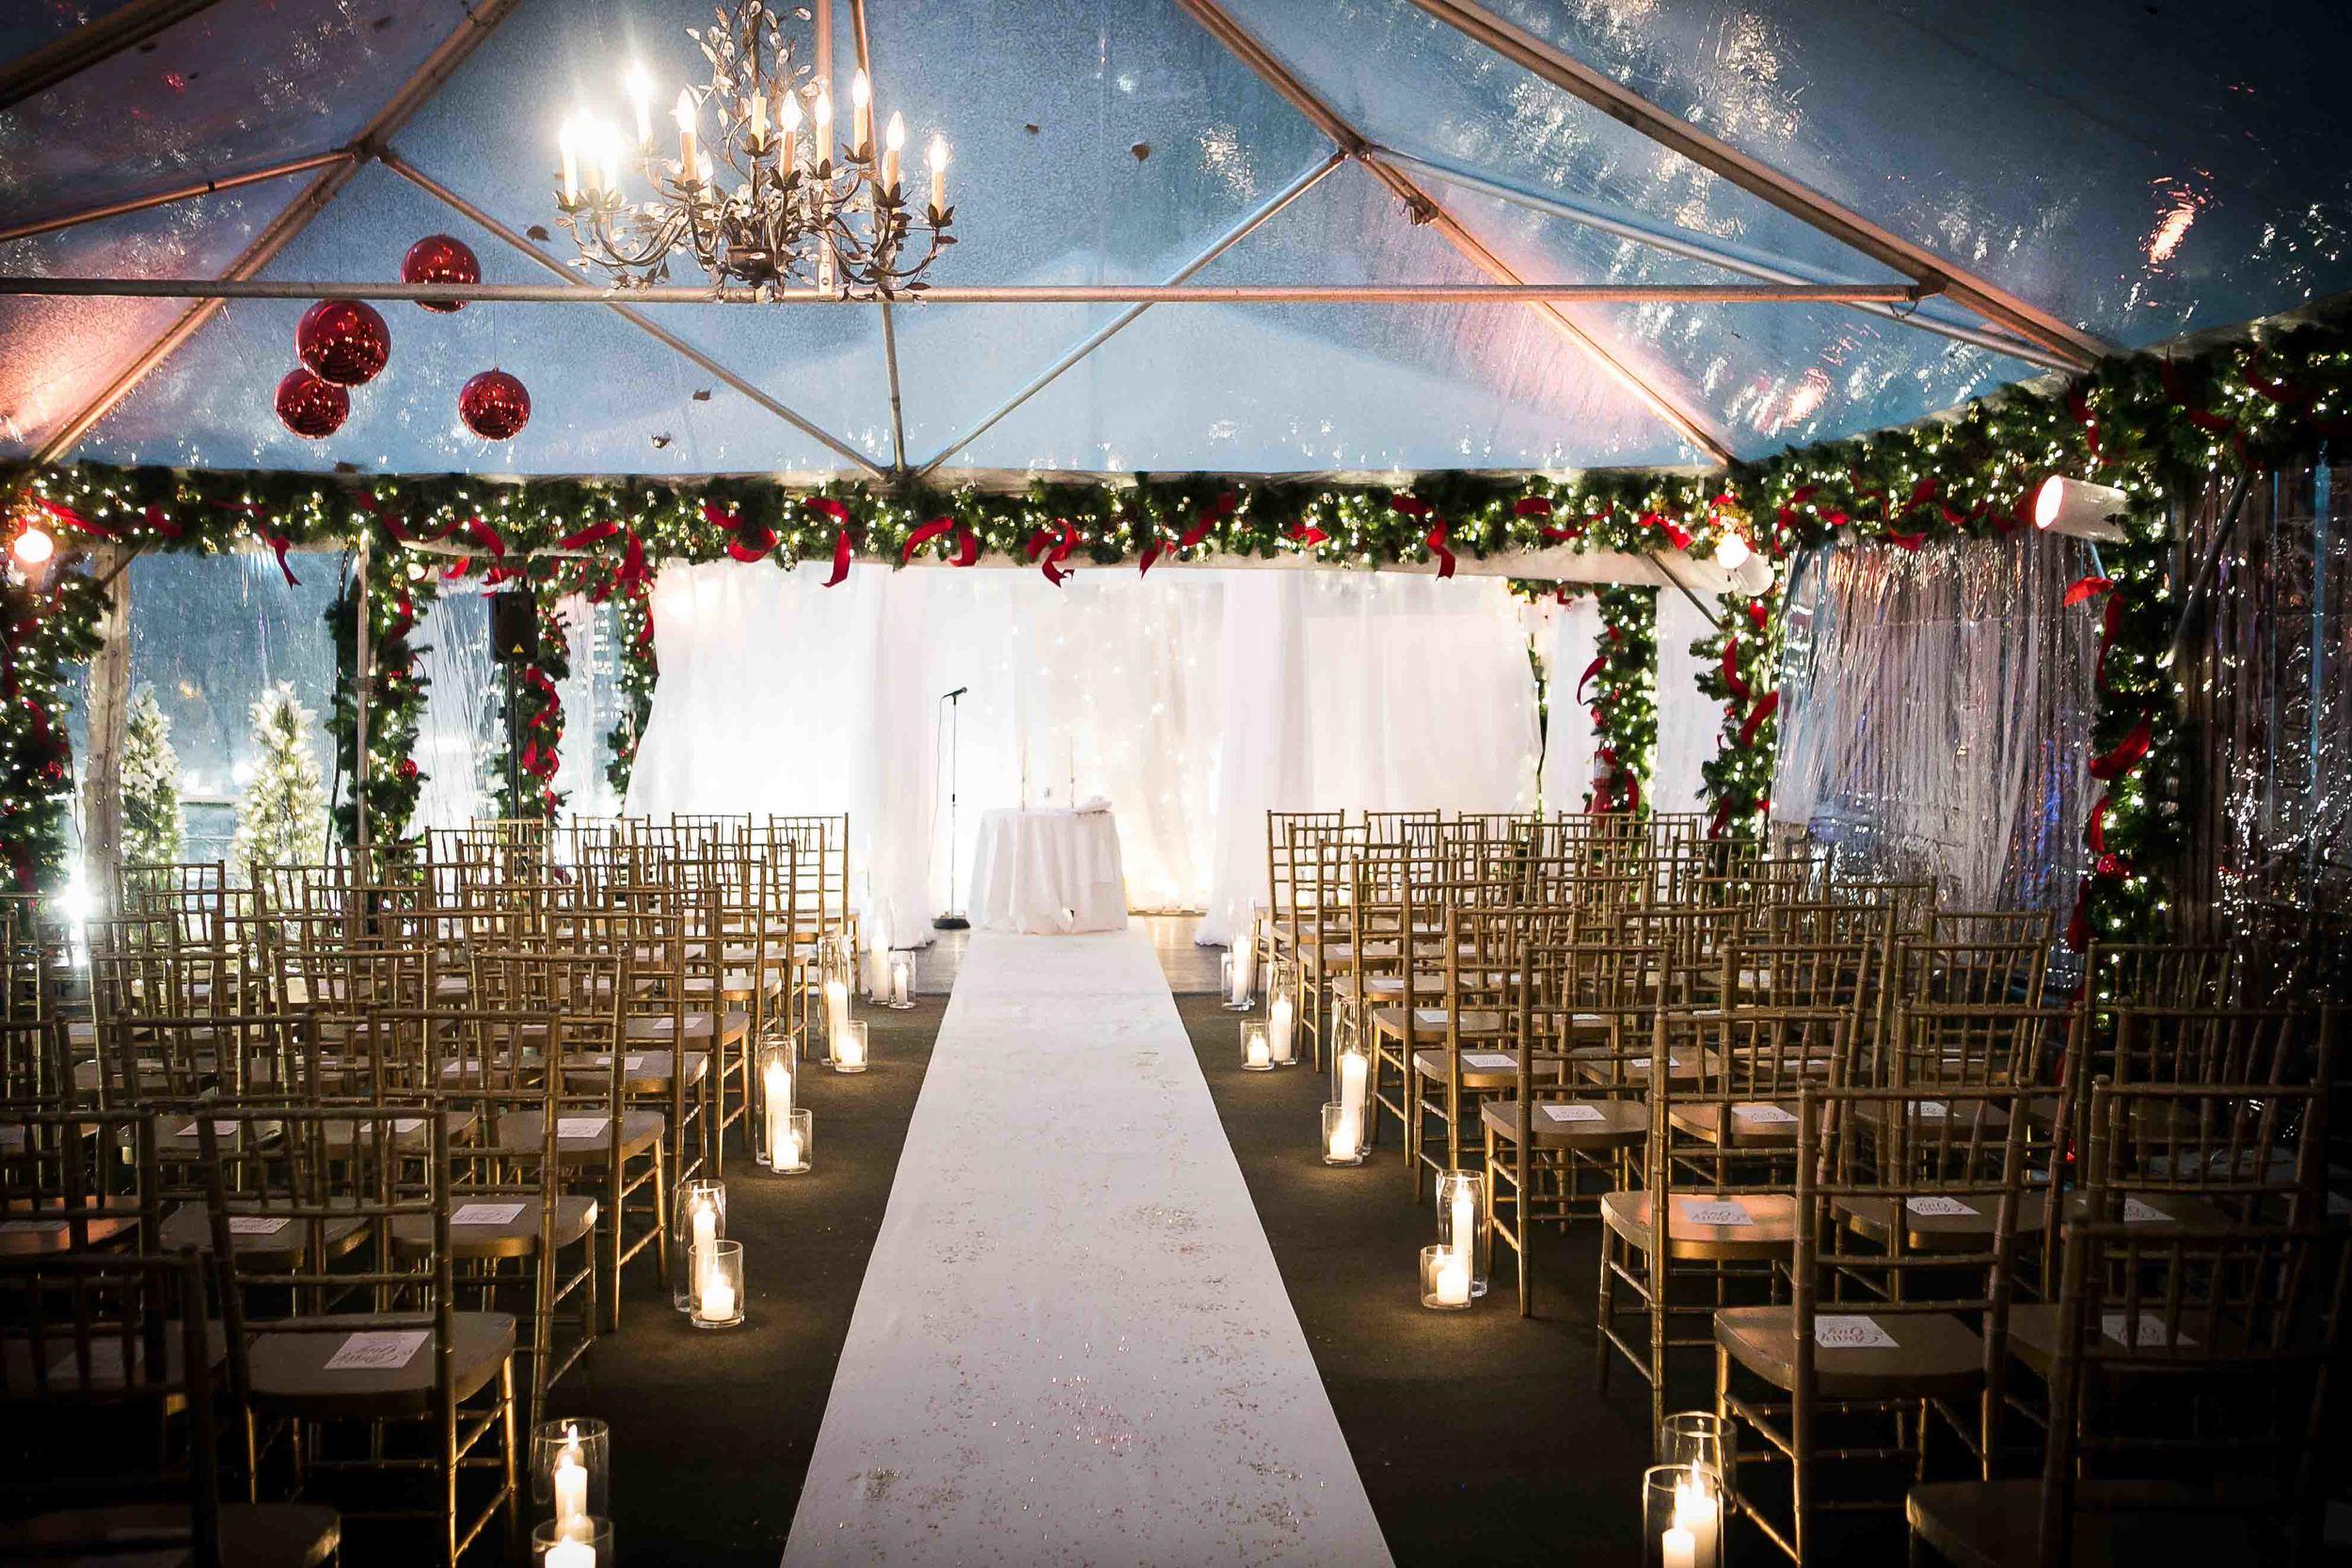 bryant-park-grill-wedding-ceremony-tent